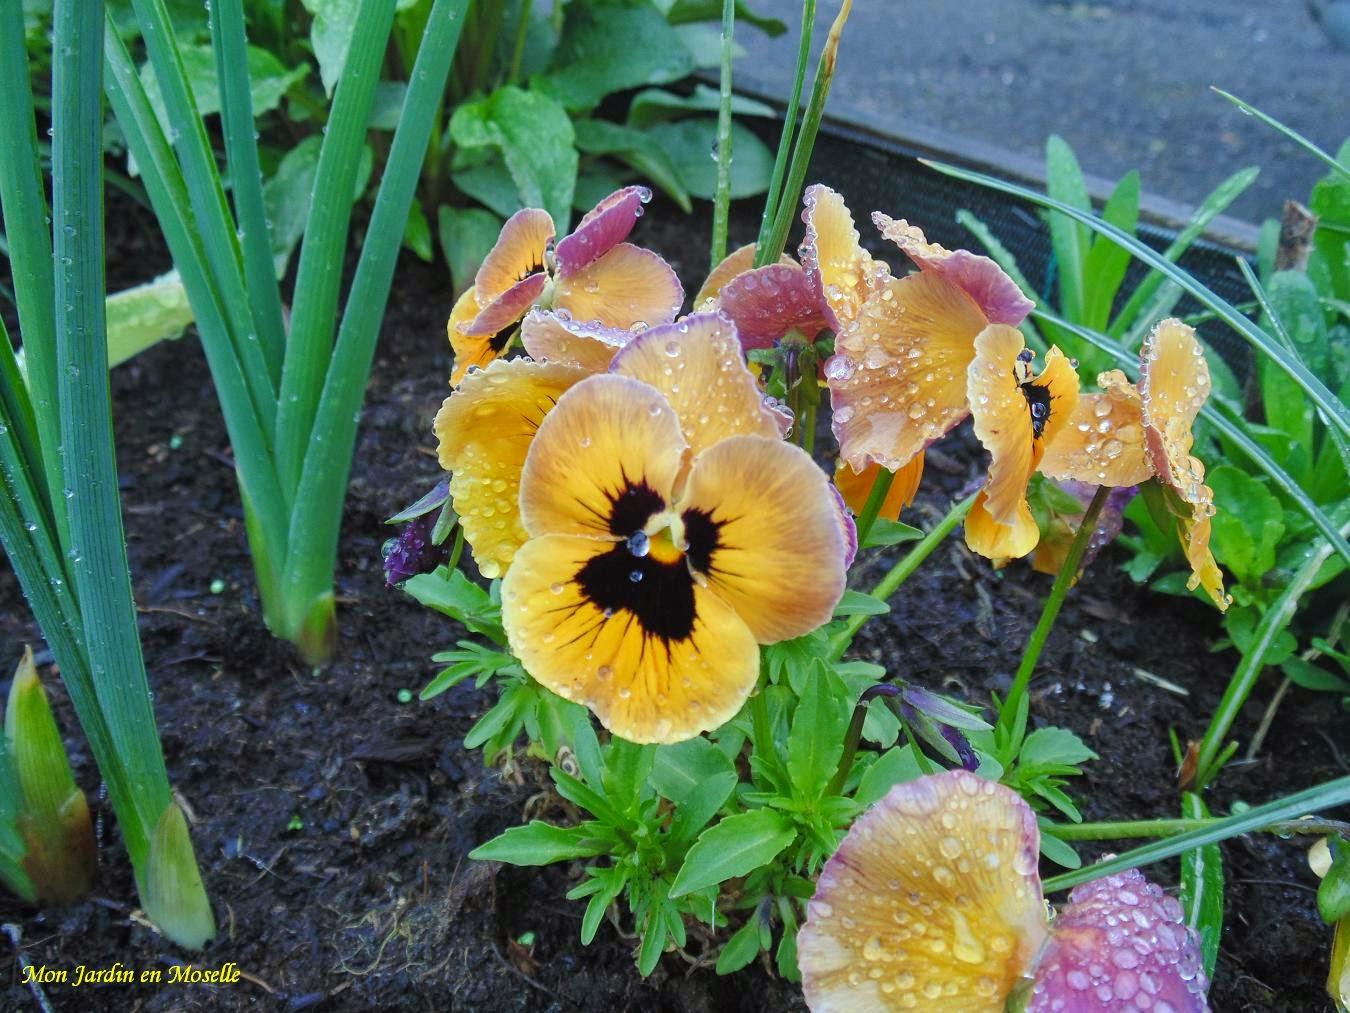 Mon jardin en moselle - Iris ne fleurissent pas ...